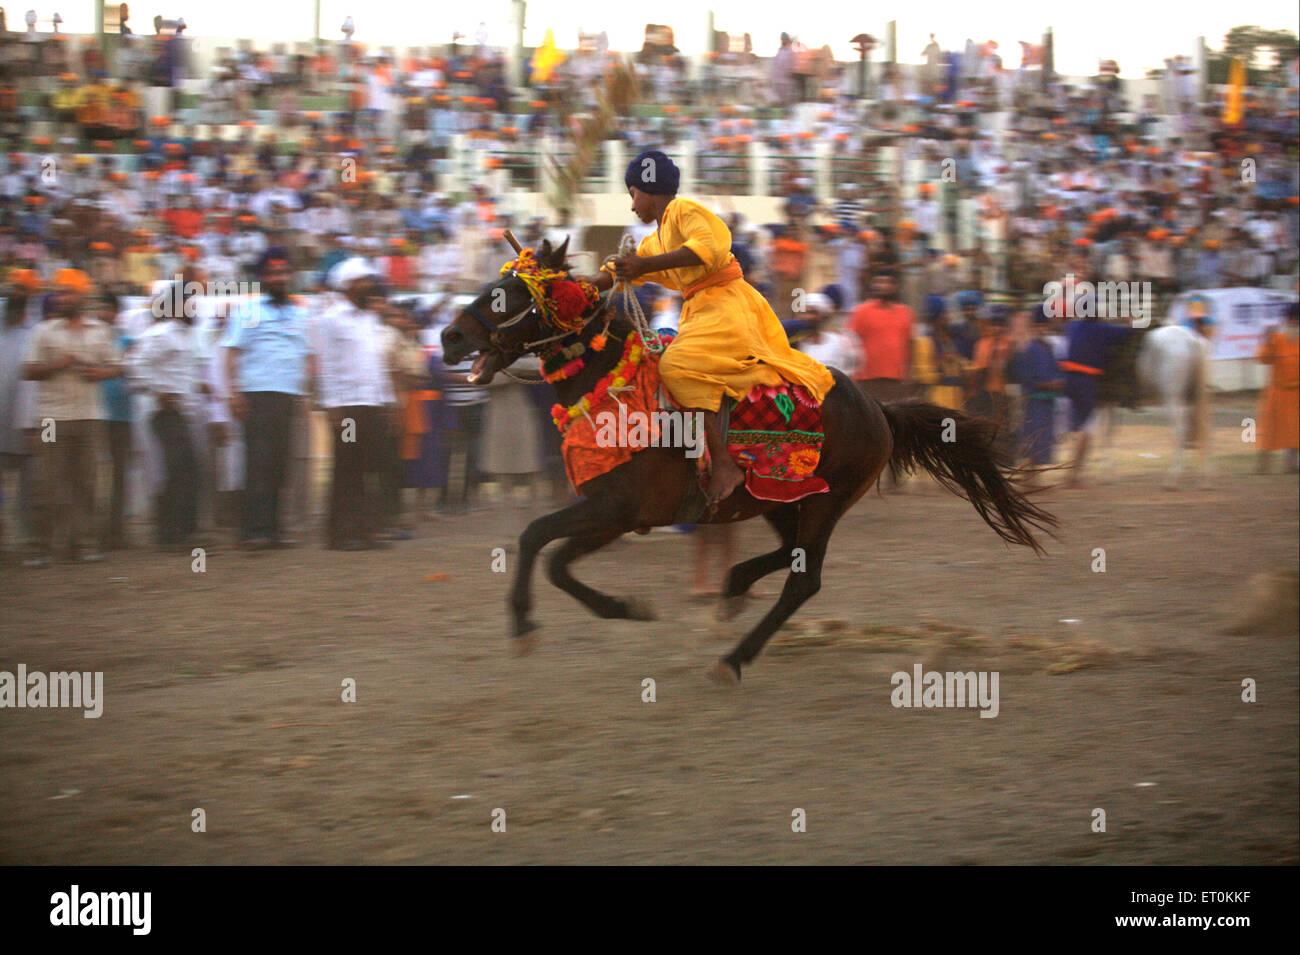 Nihang Sikh warrior performing stunts ; event onsecration of perpetual Guru of Sikh Guru Granth at Khalsa Sports - Stock Image